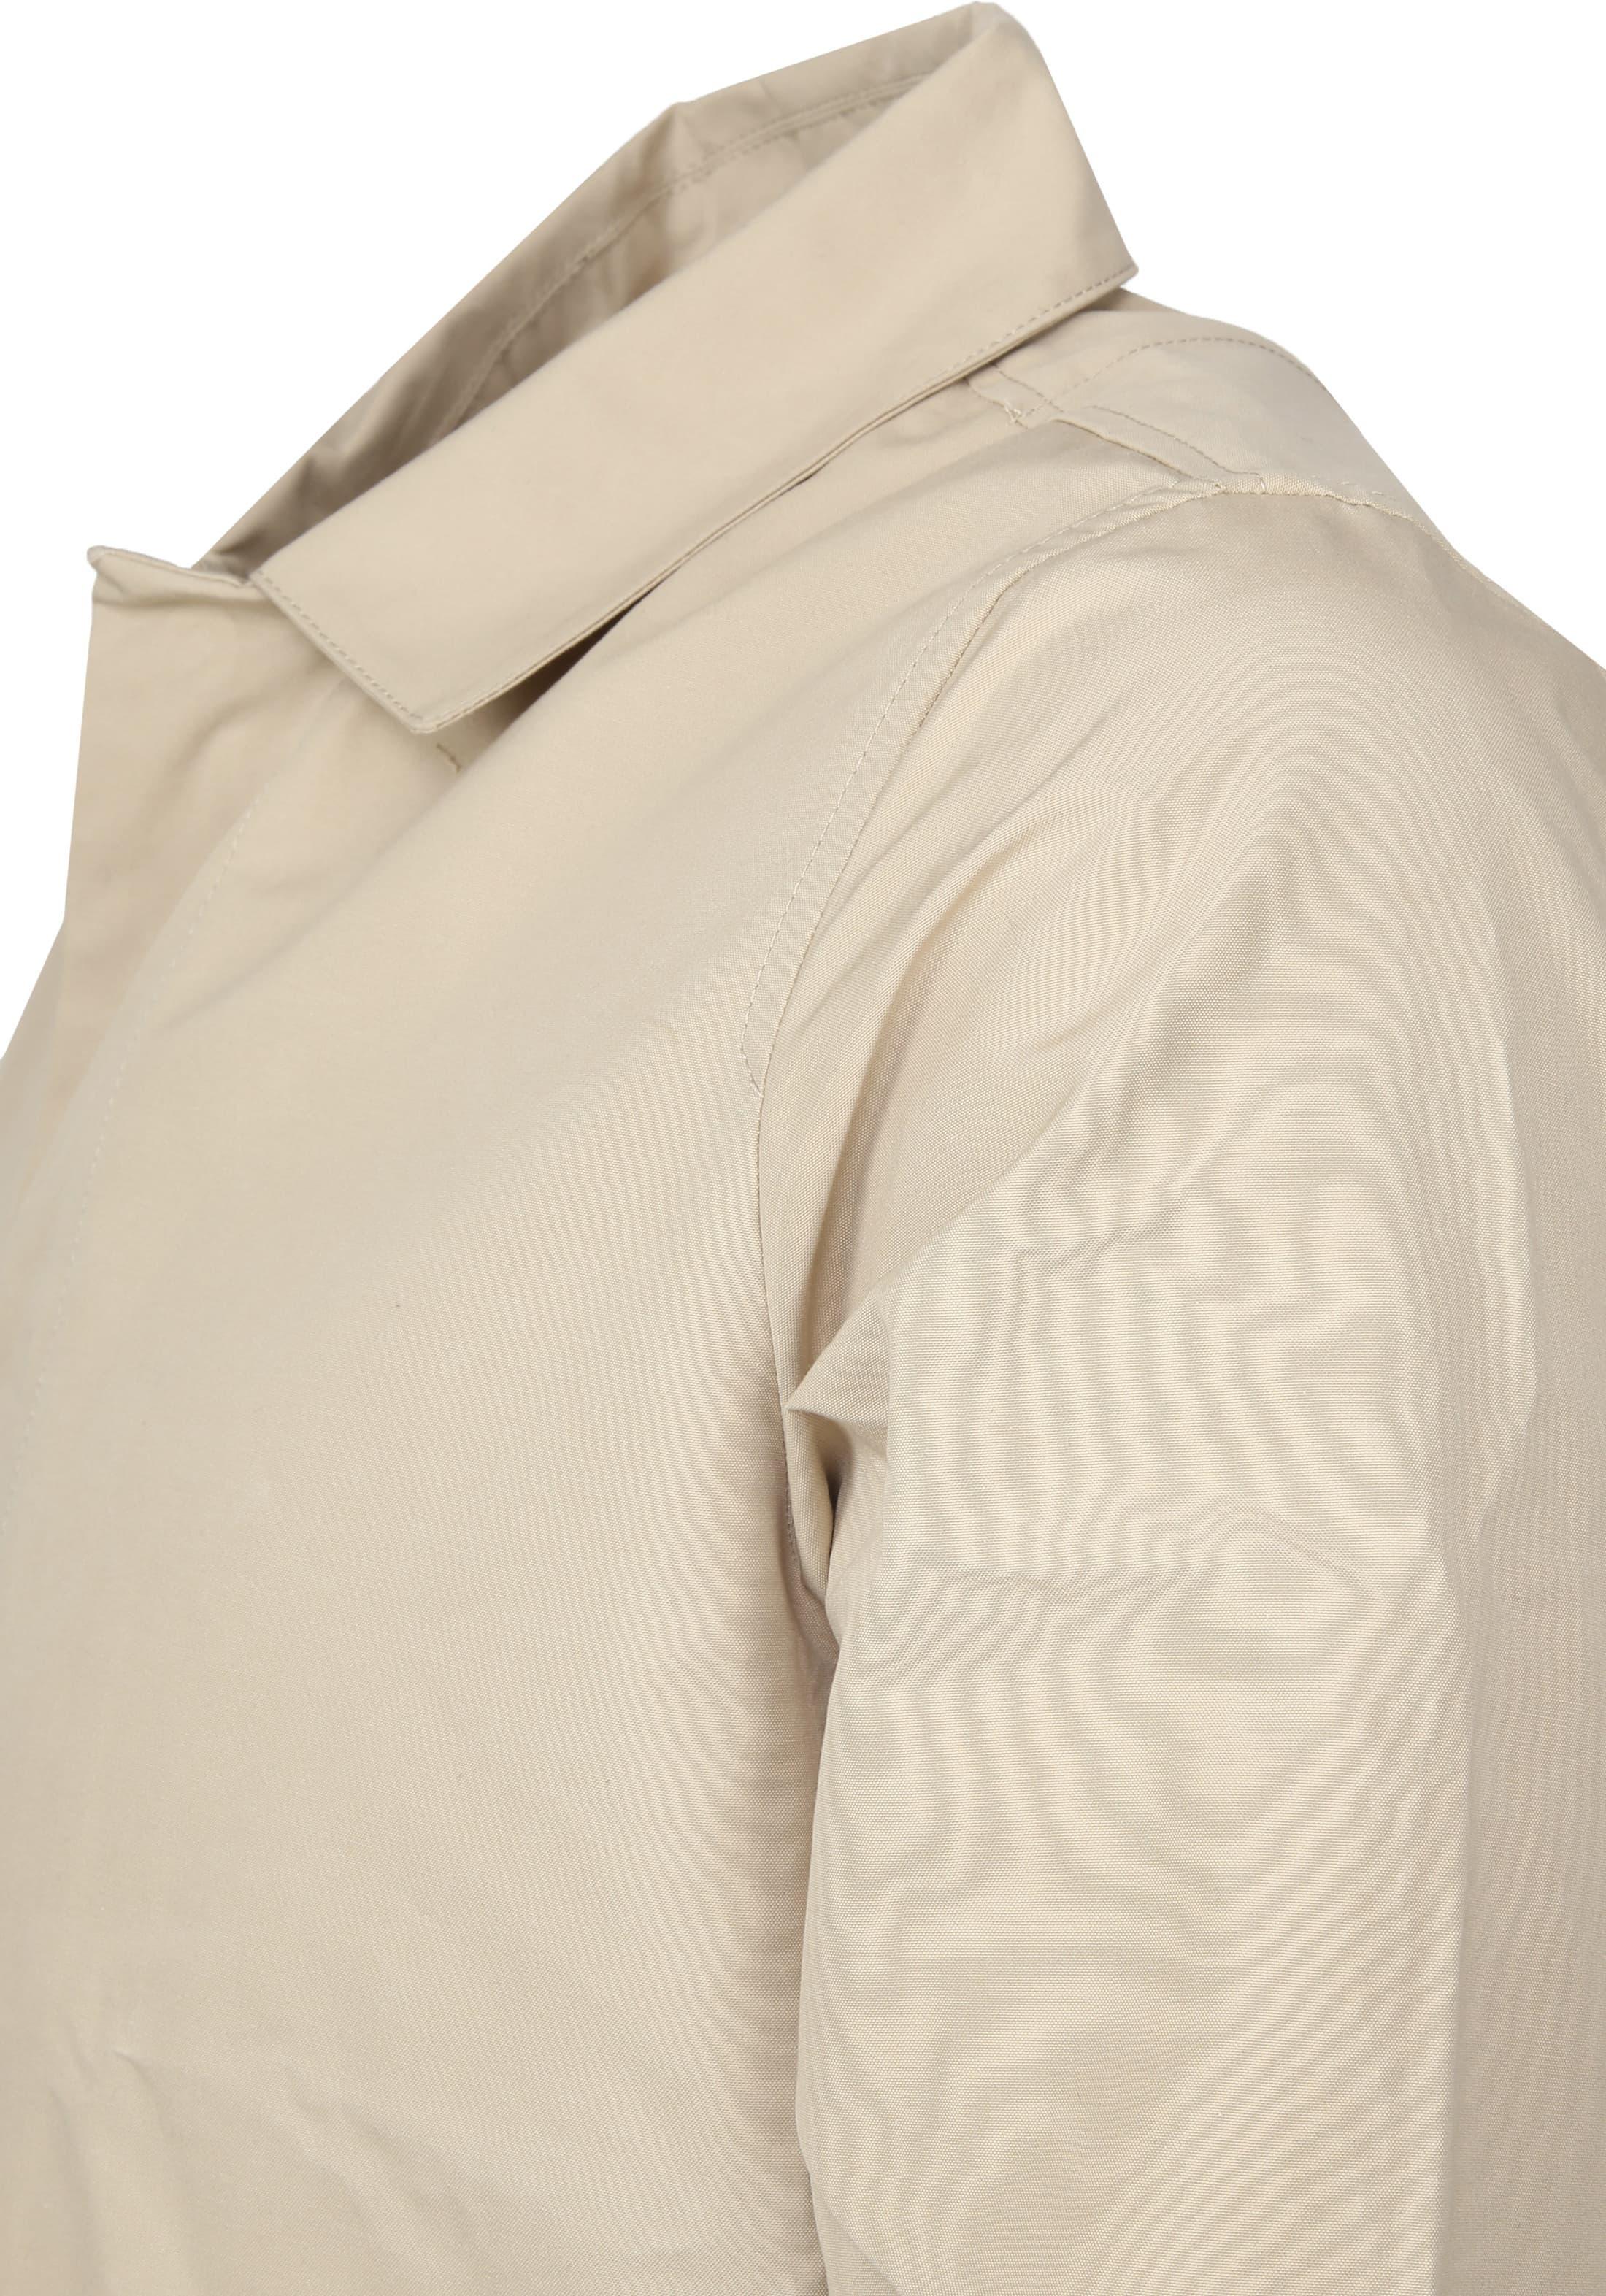 Knowledge Cotton Apparel Carcoat Beige foto 2